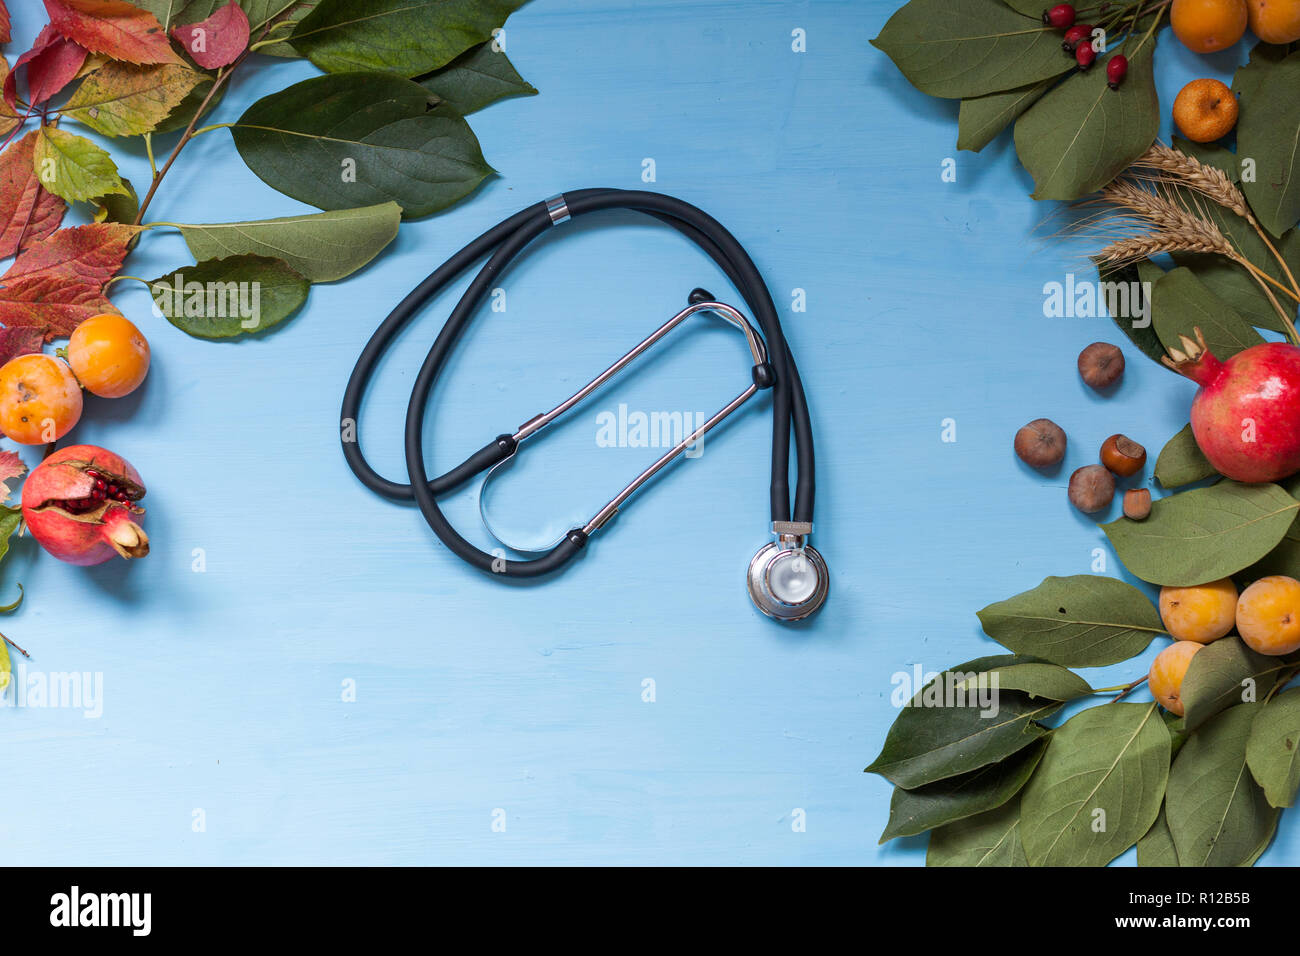 medicine autumn disease doctor stethoscope nice leaves - Stock Image